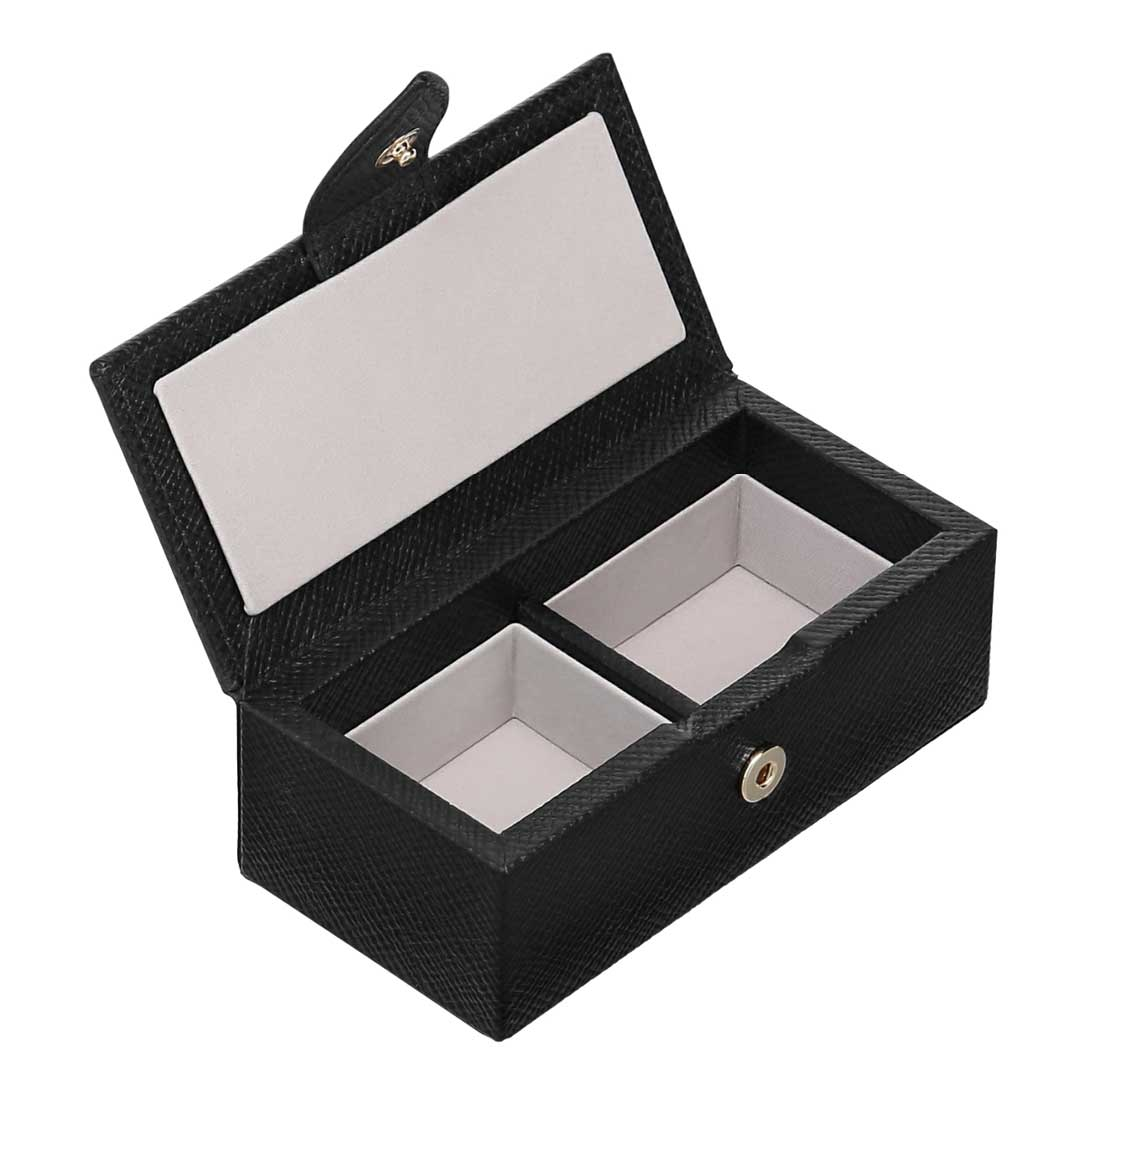 Smythson Panama Cross-Grain Leather Cufflink Box